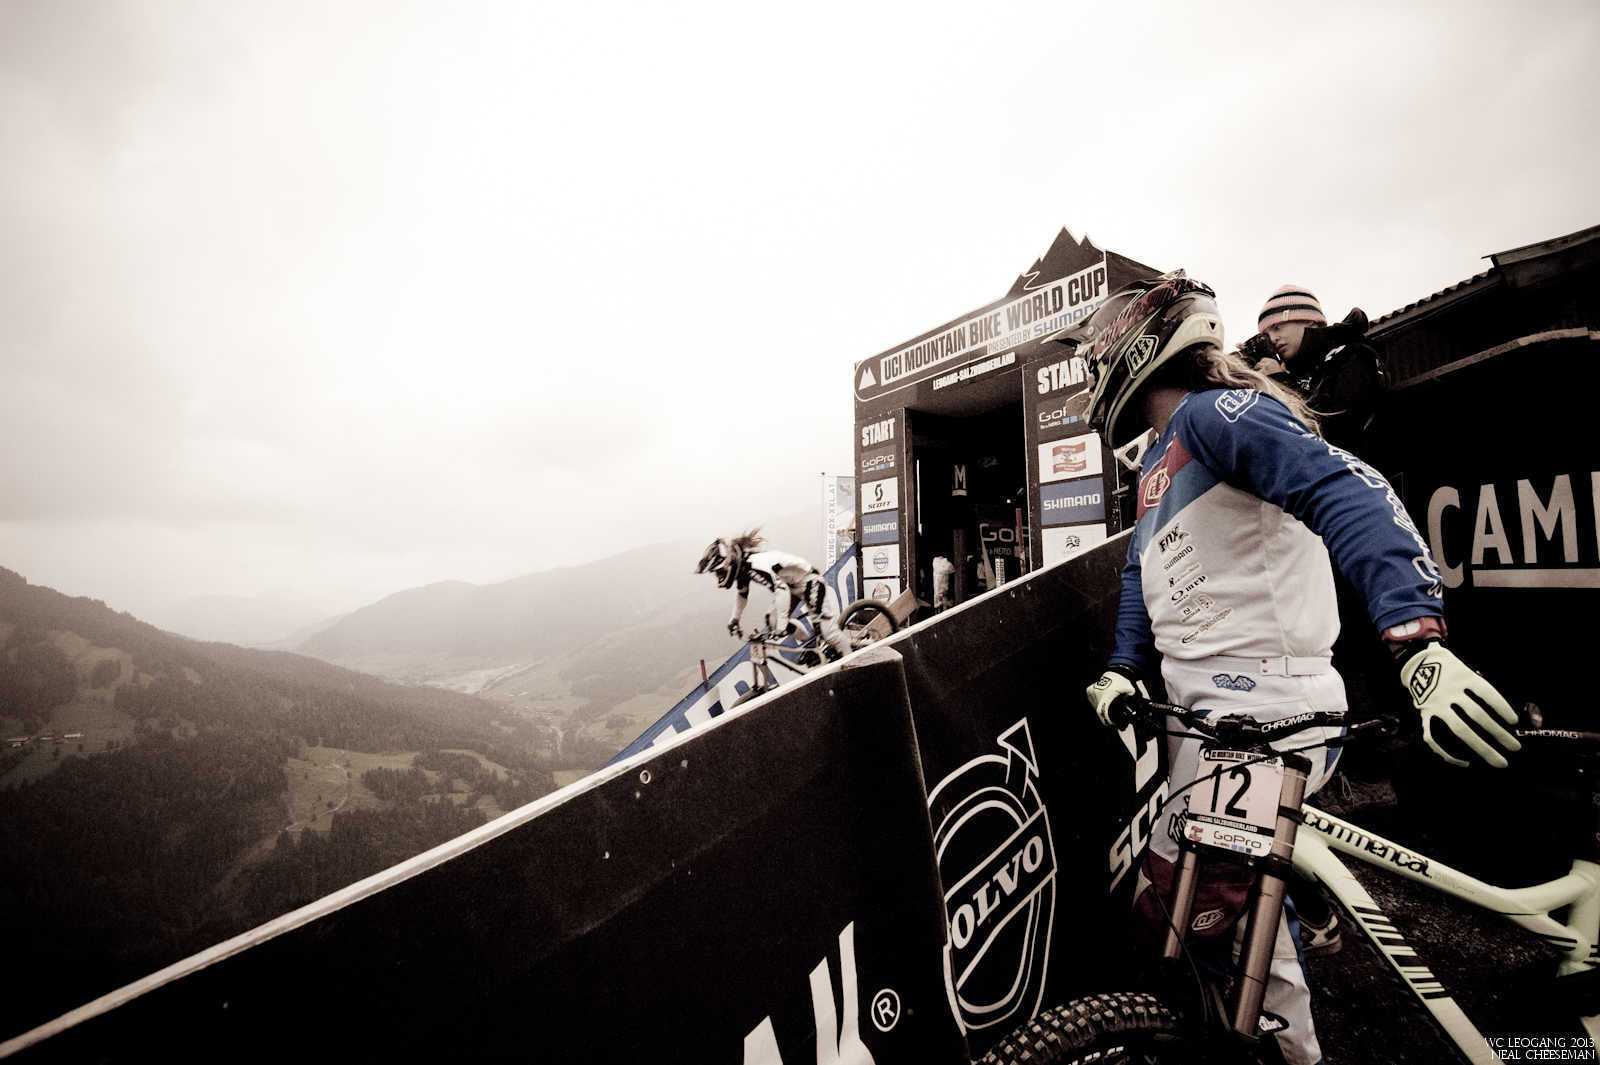 WC Leogang 2013 -1 - Cheeseman - Mountain Biking Pictures - Vital MTB